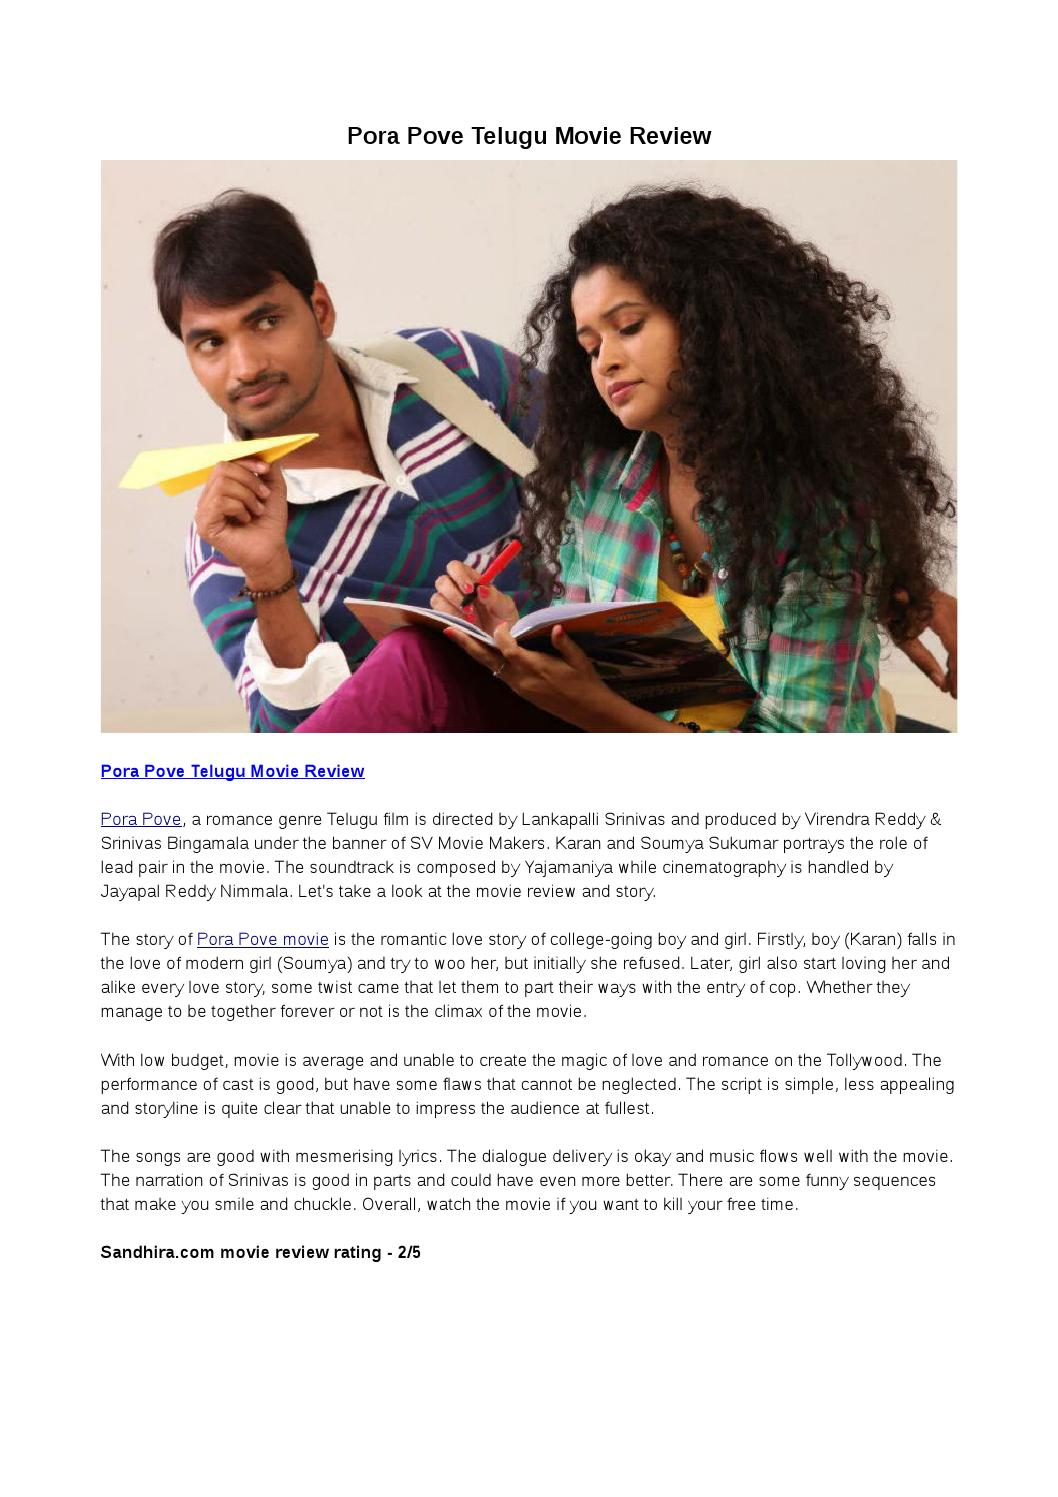 Pora Pove Telugu Movie Review By Entsandhira Issuu